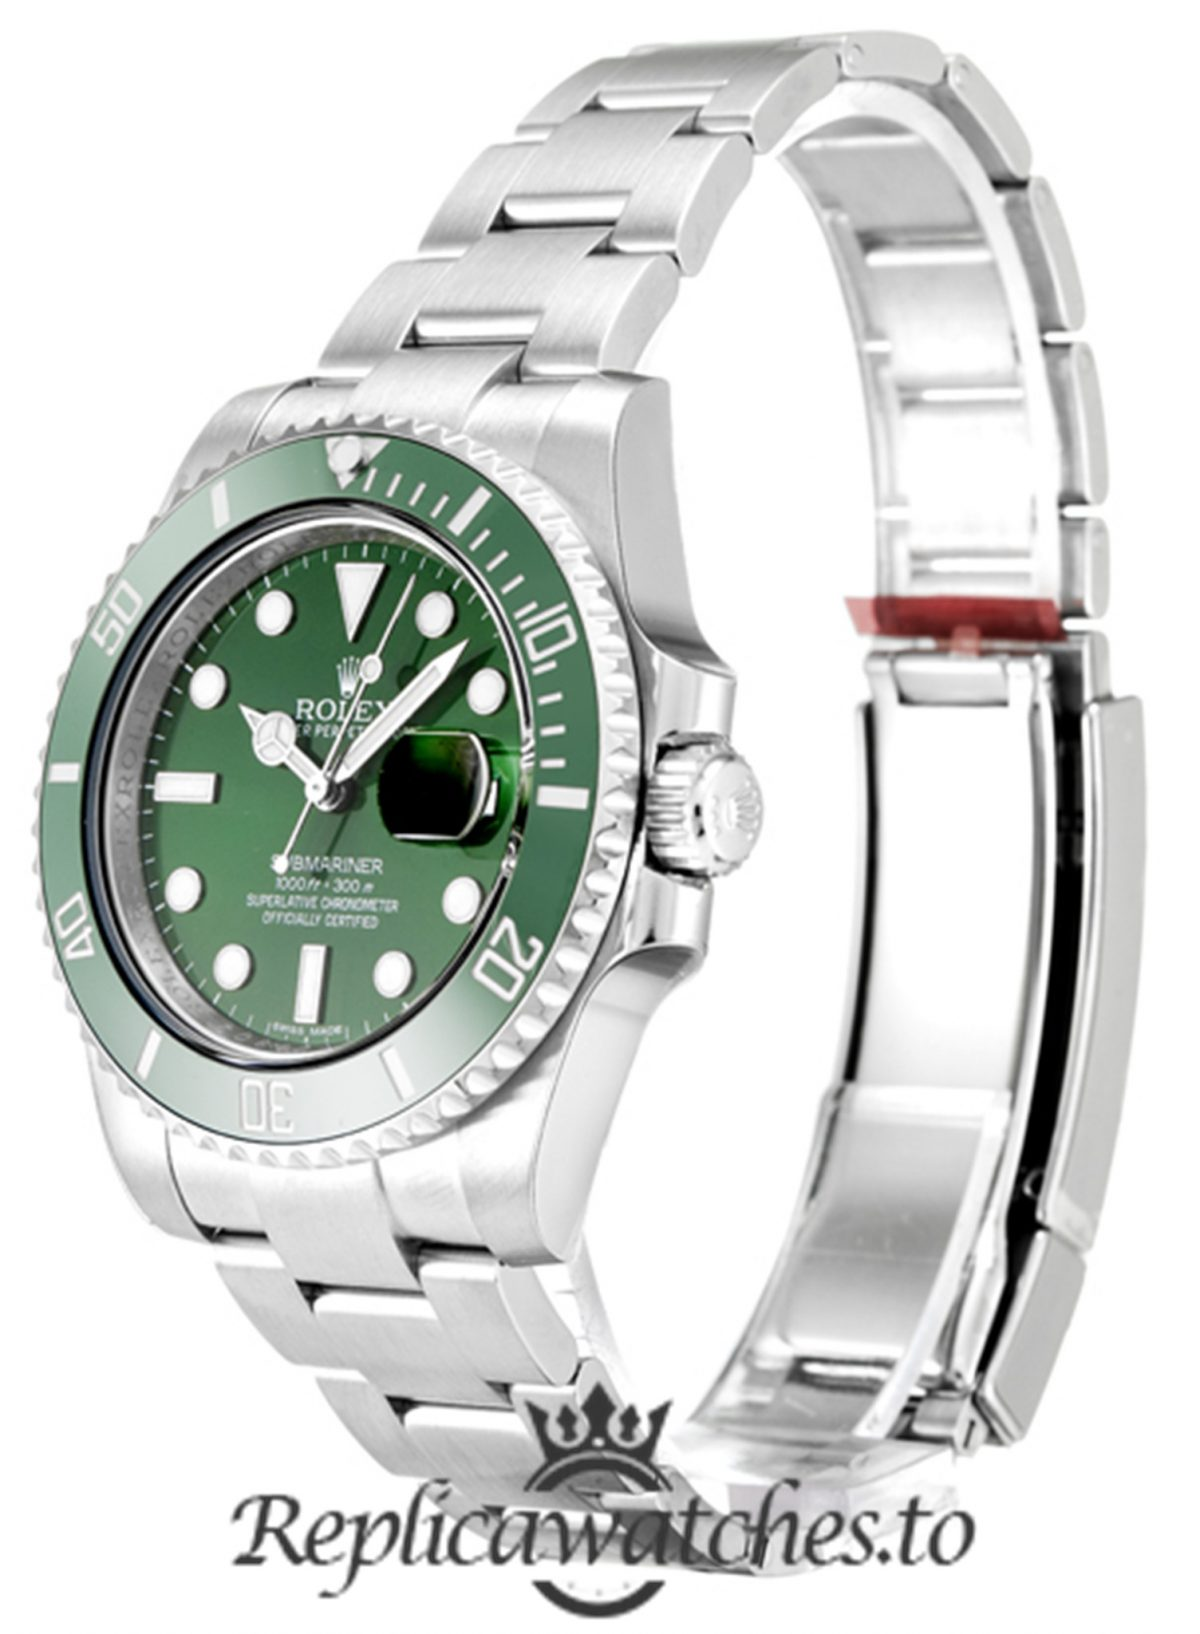 Rolex Submariner Replica 116610 LV Green Bezel 40MM